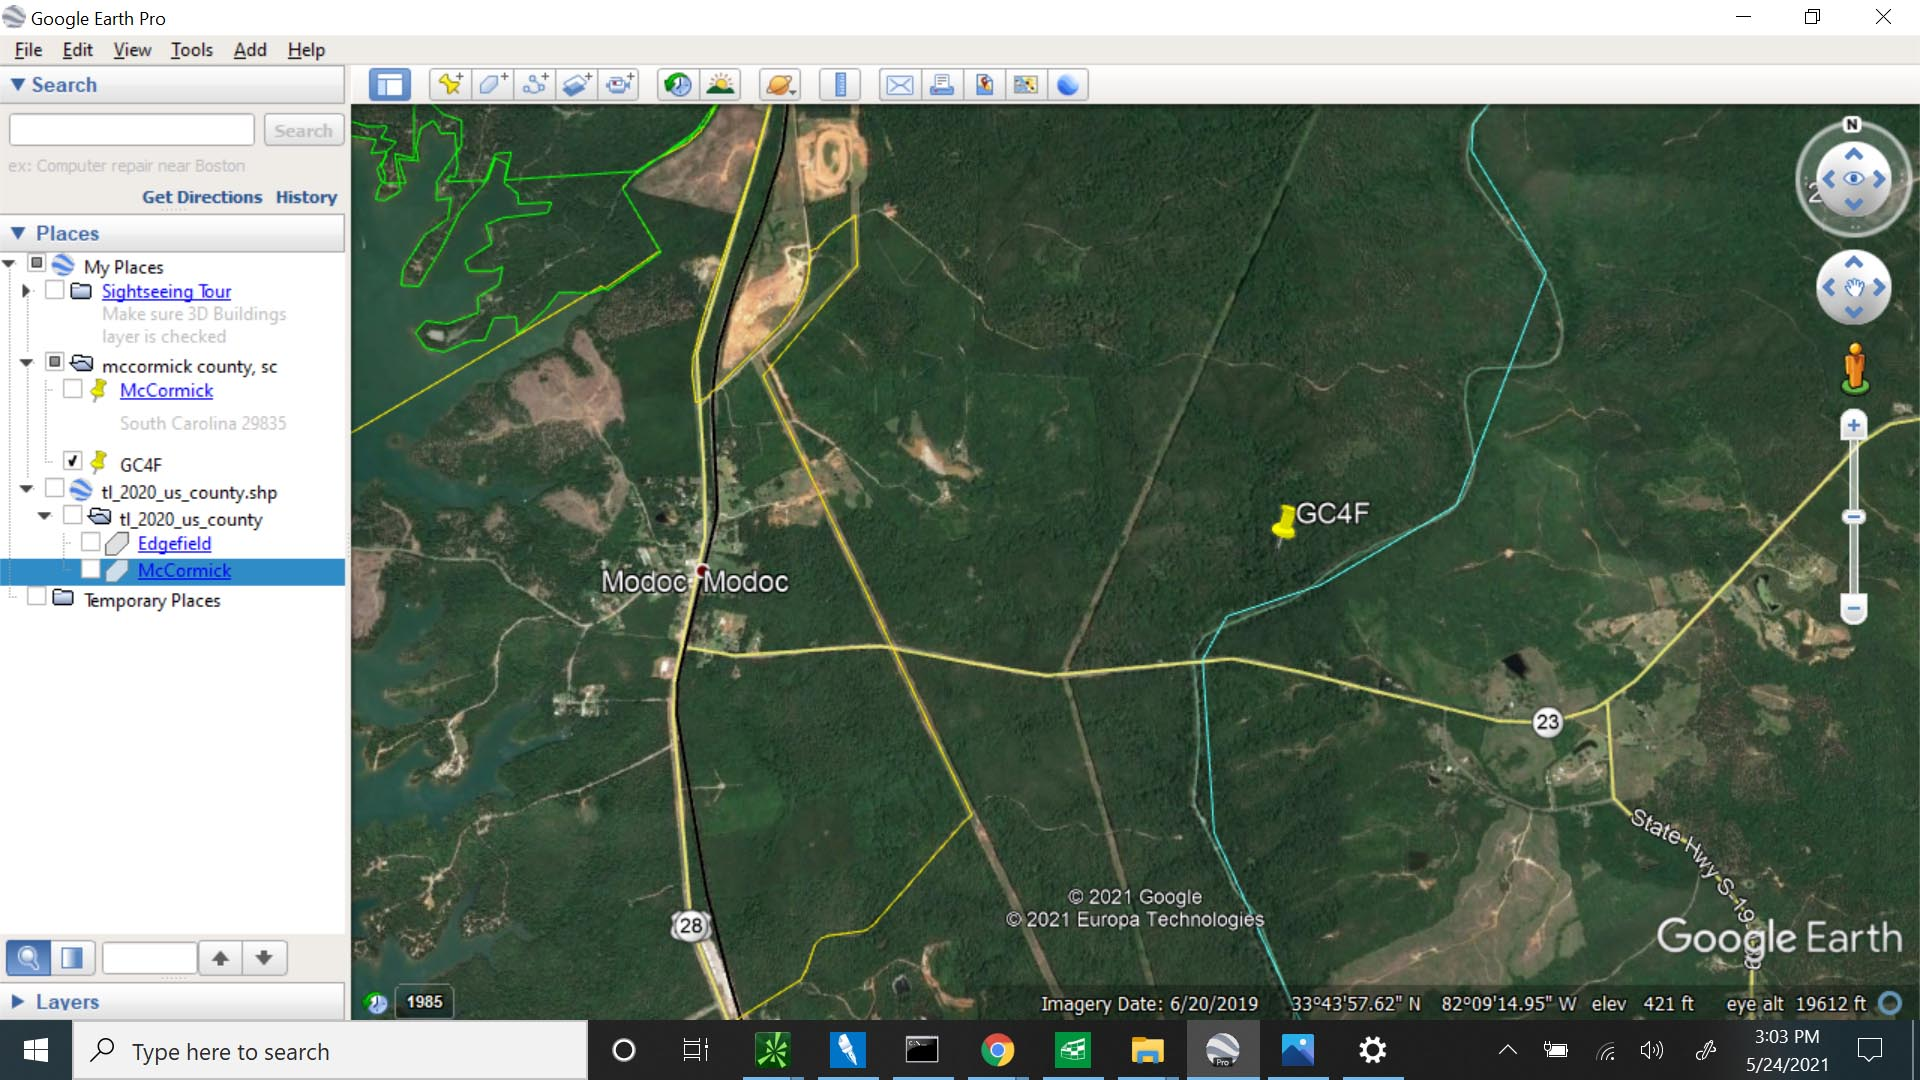 Modoc GeoCache - GC4F - McCormick County